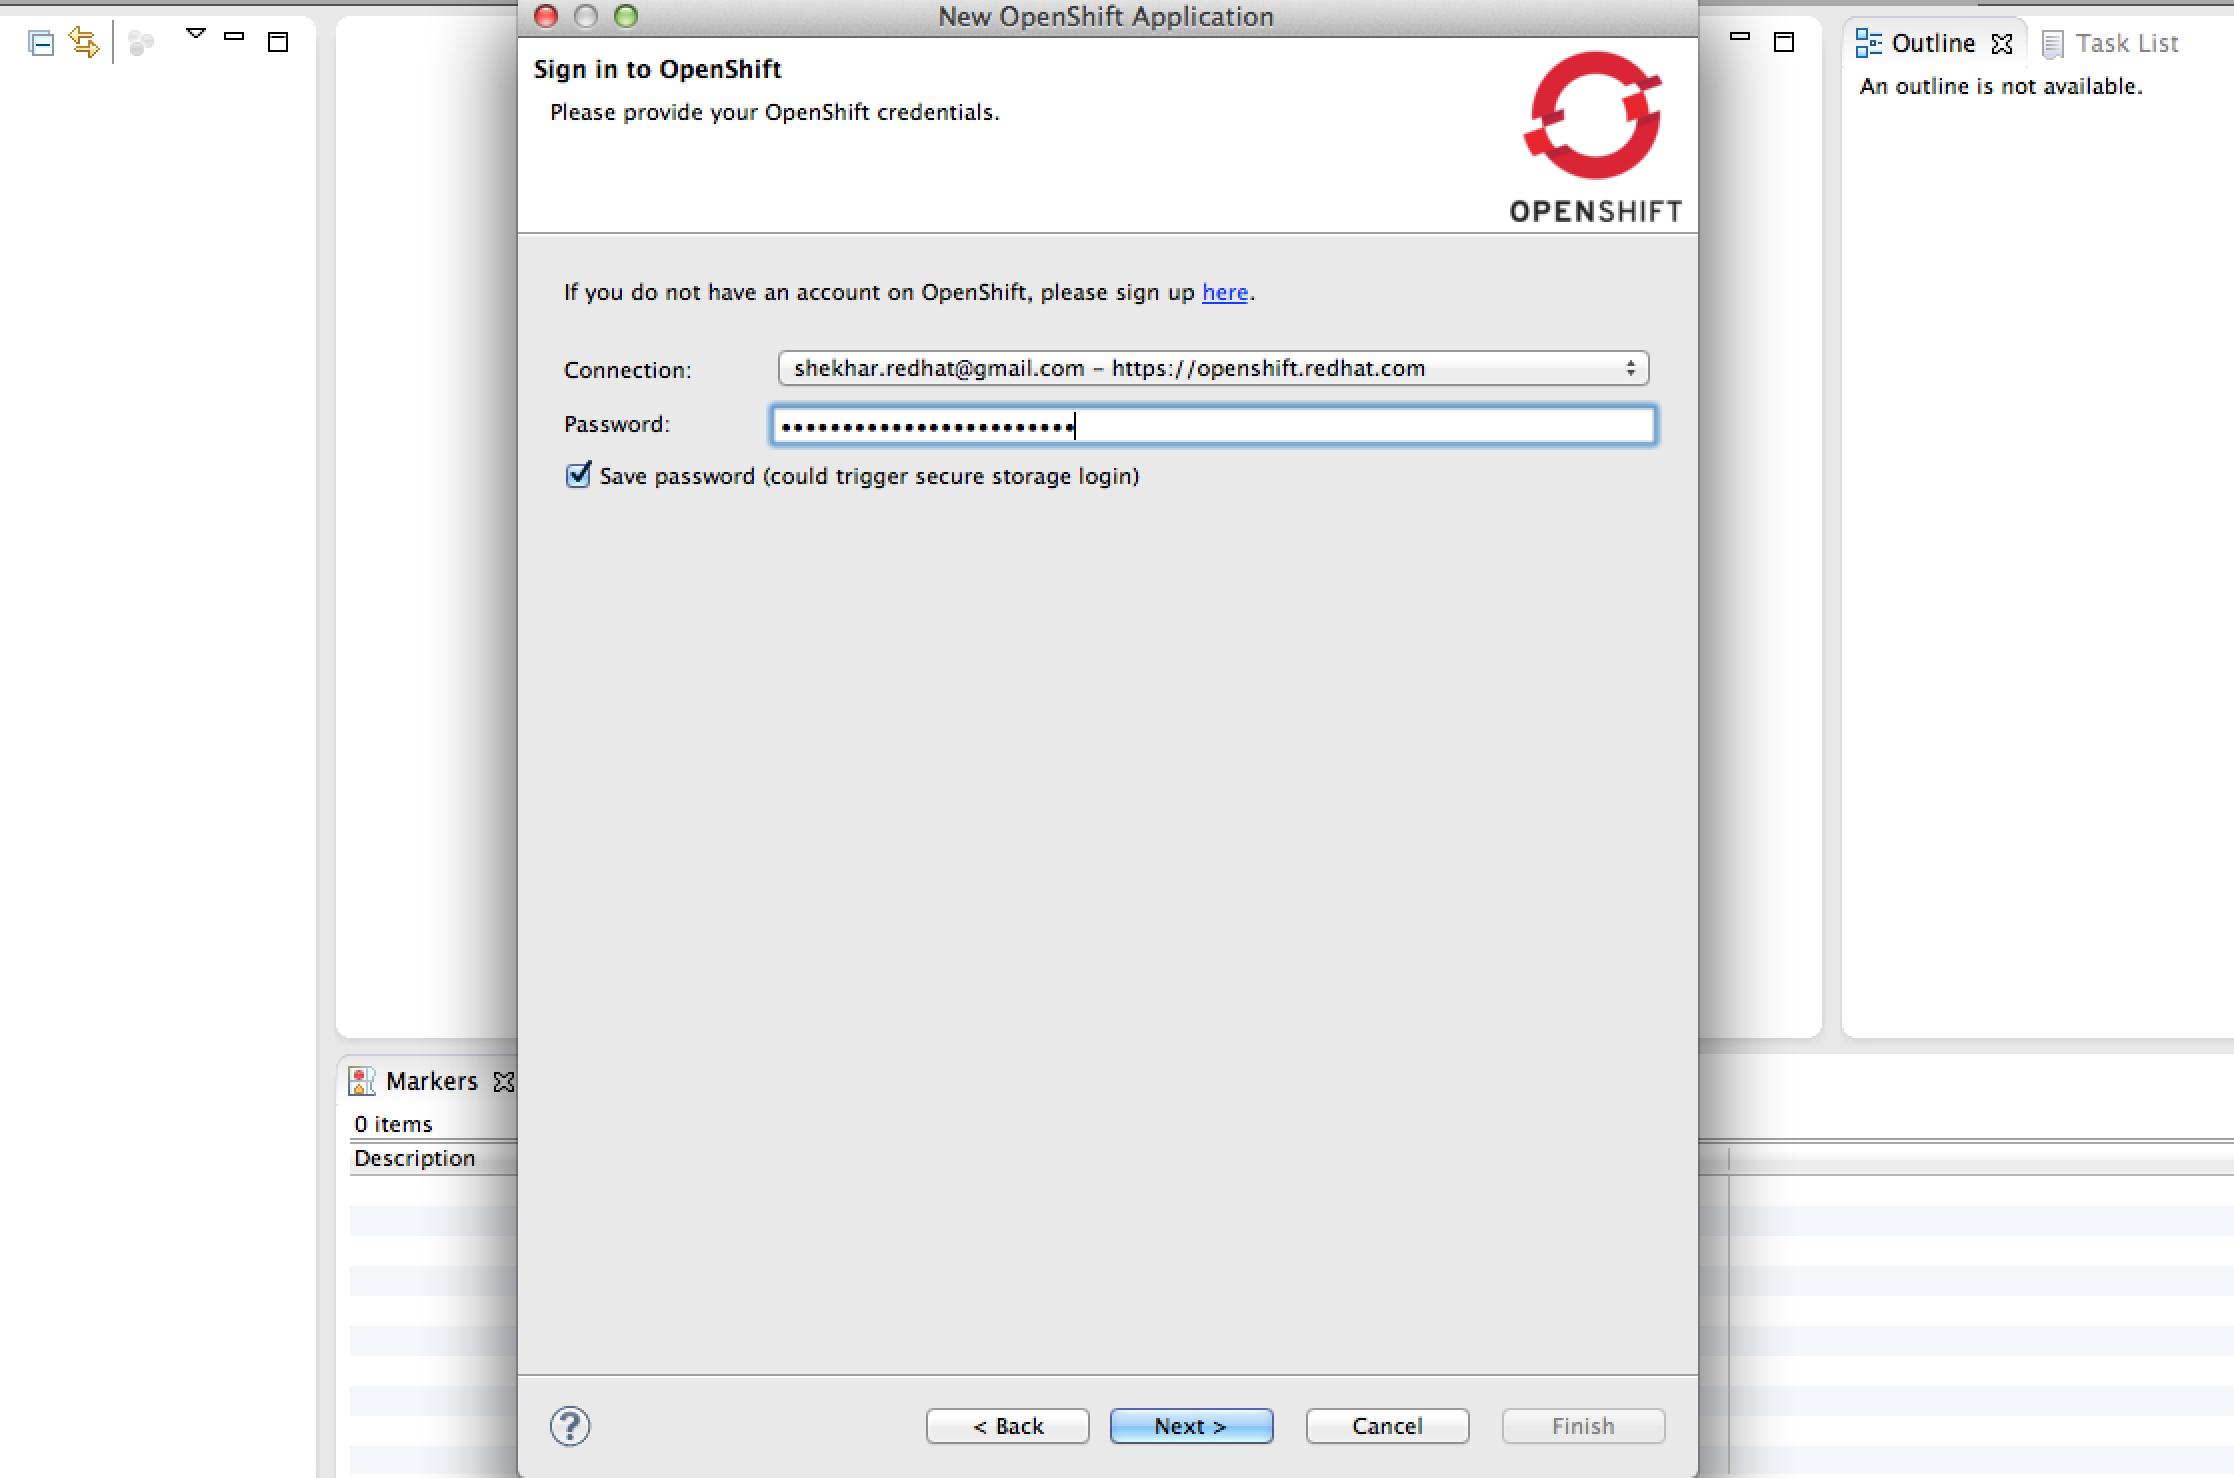 Create App Step 1